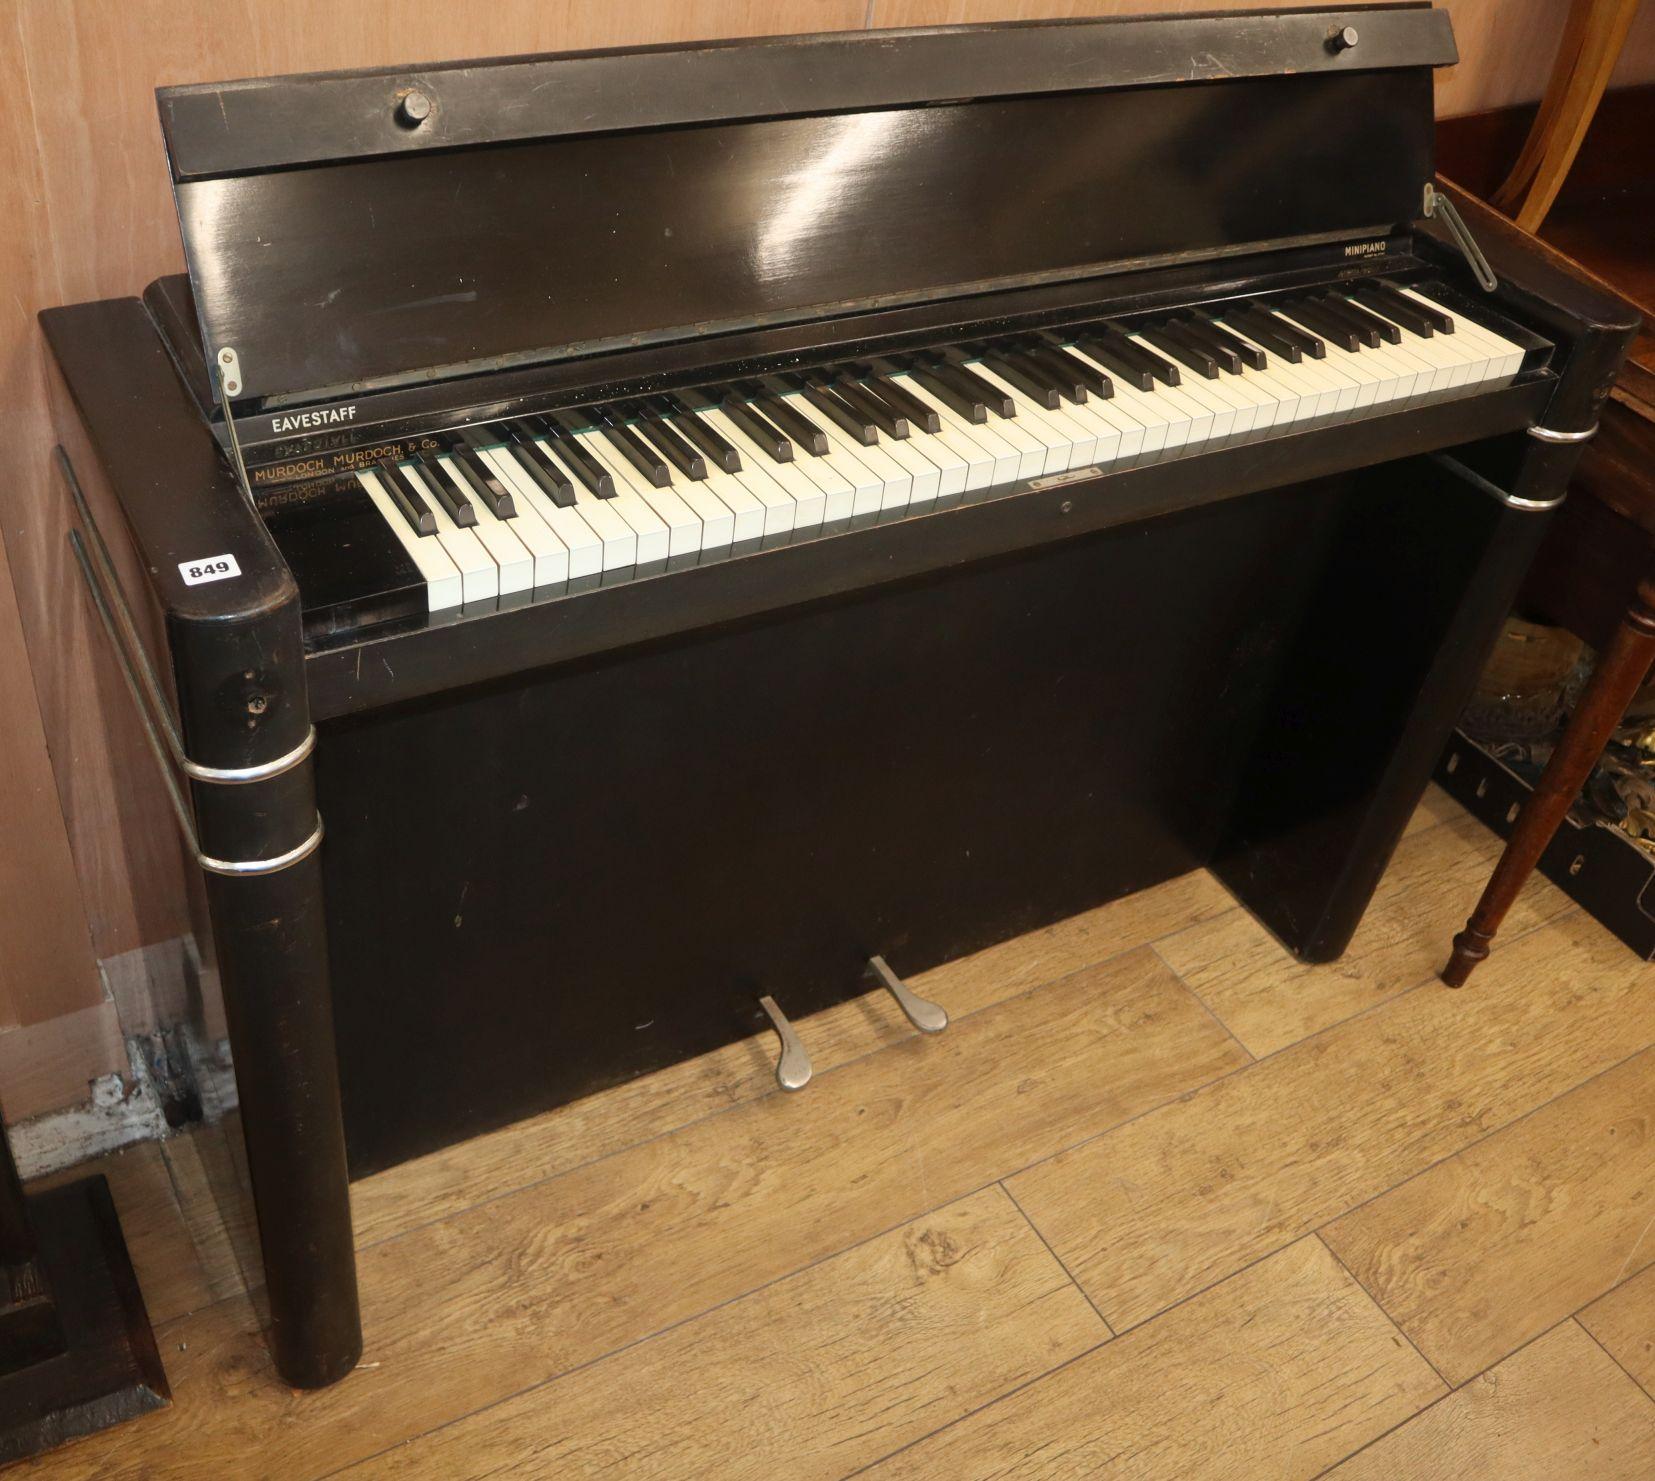 Lot 849 - An Art Deco style ebonised Eavestaff mini piano W.130cm